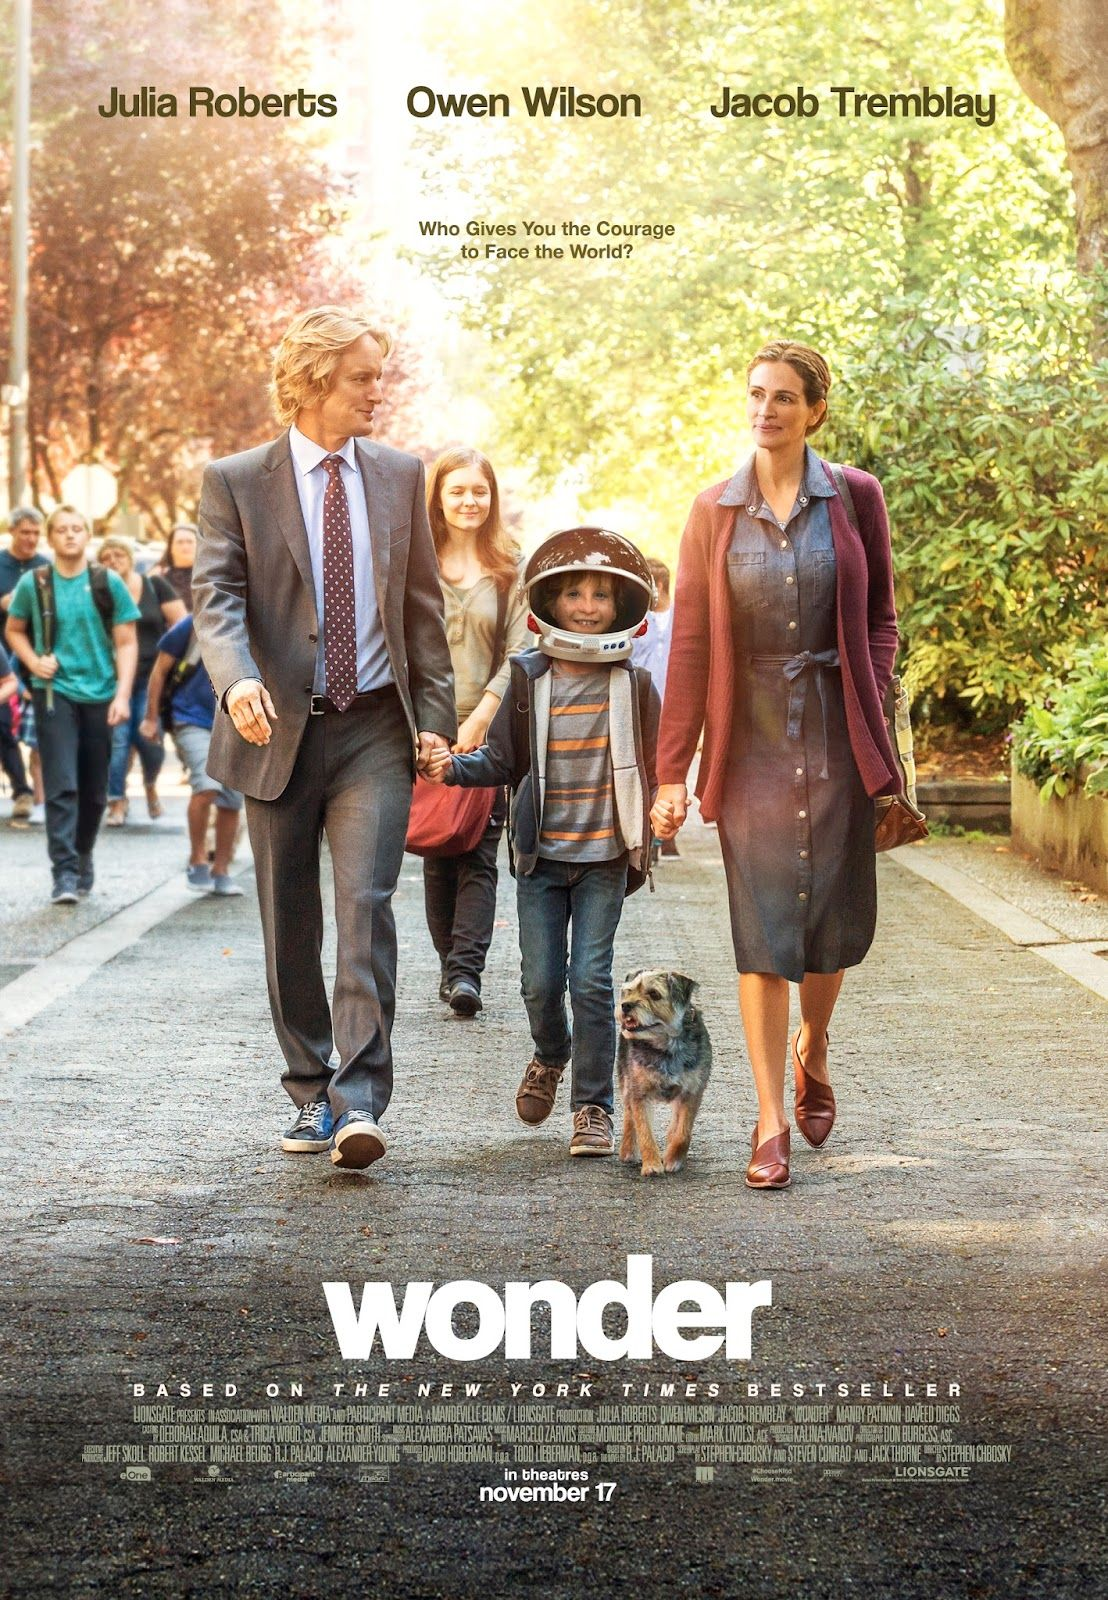 Wonder new film poster